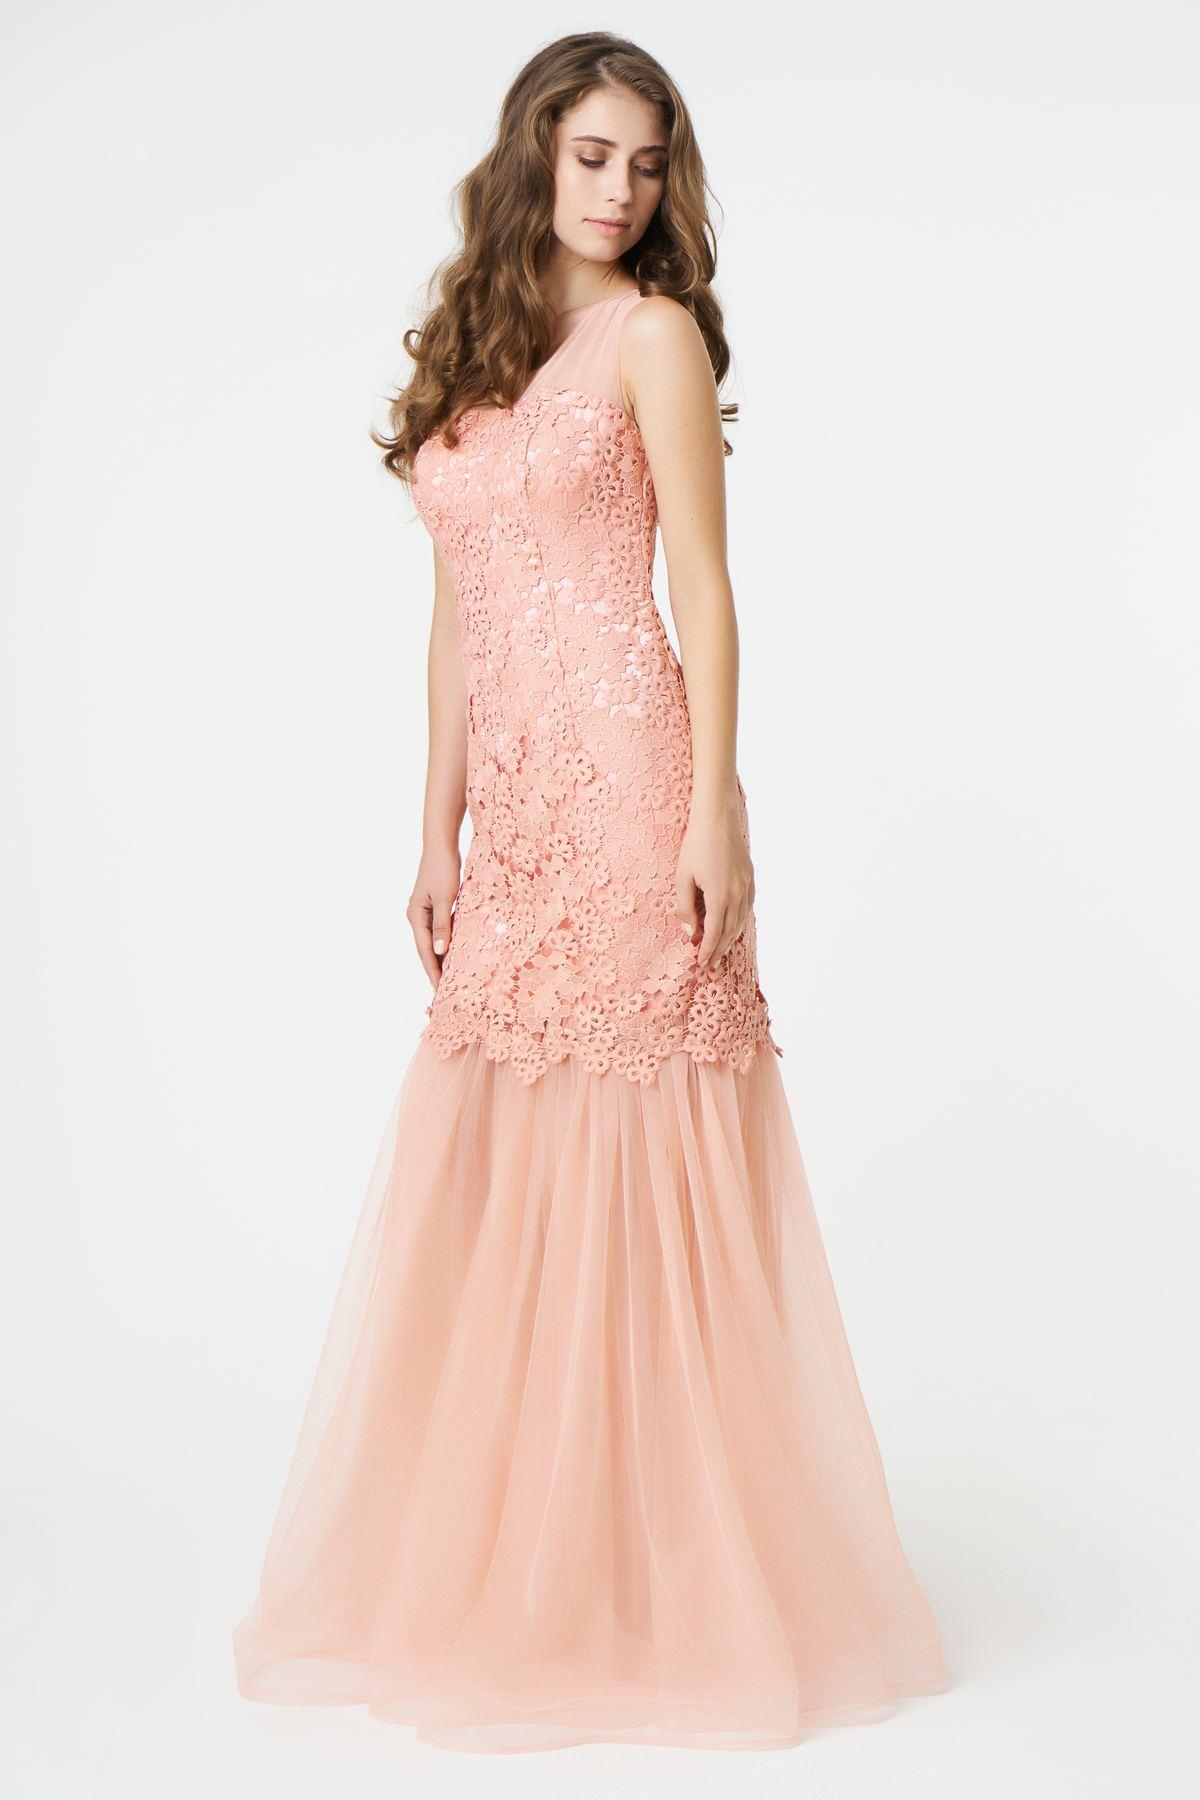 b5a9b4297a1 Вечернее платье в пол из гипюра и шифона